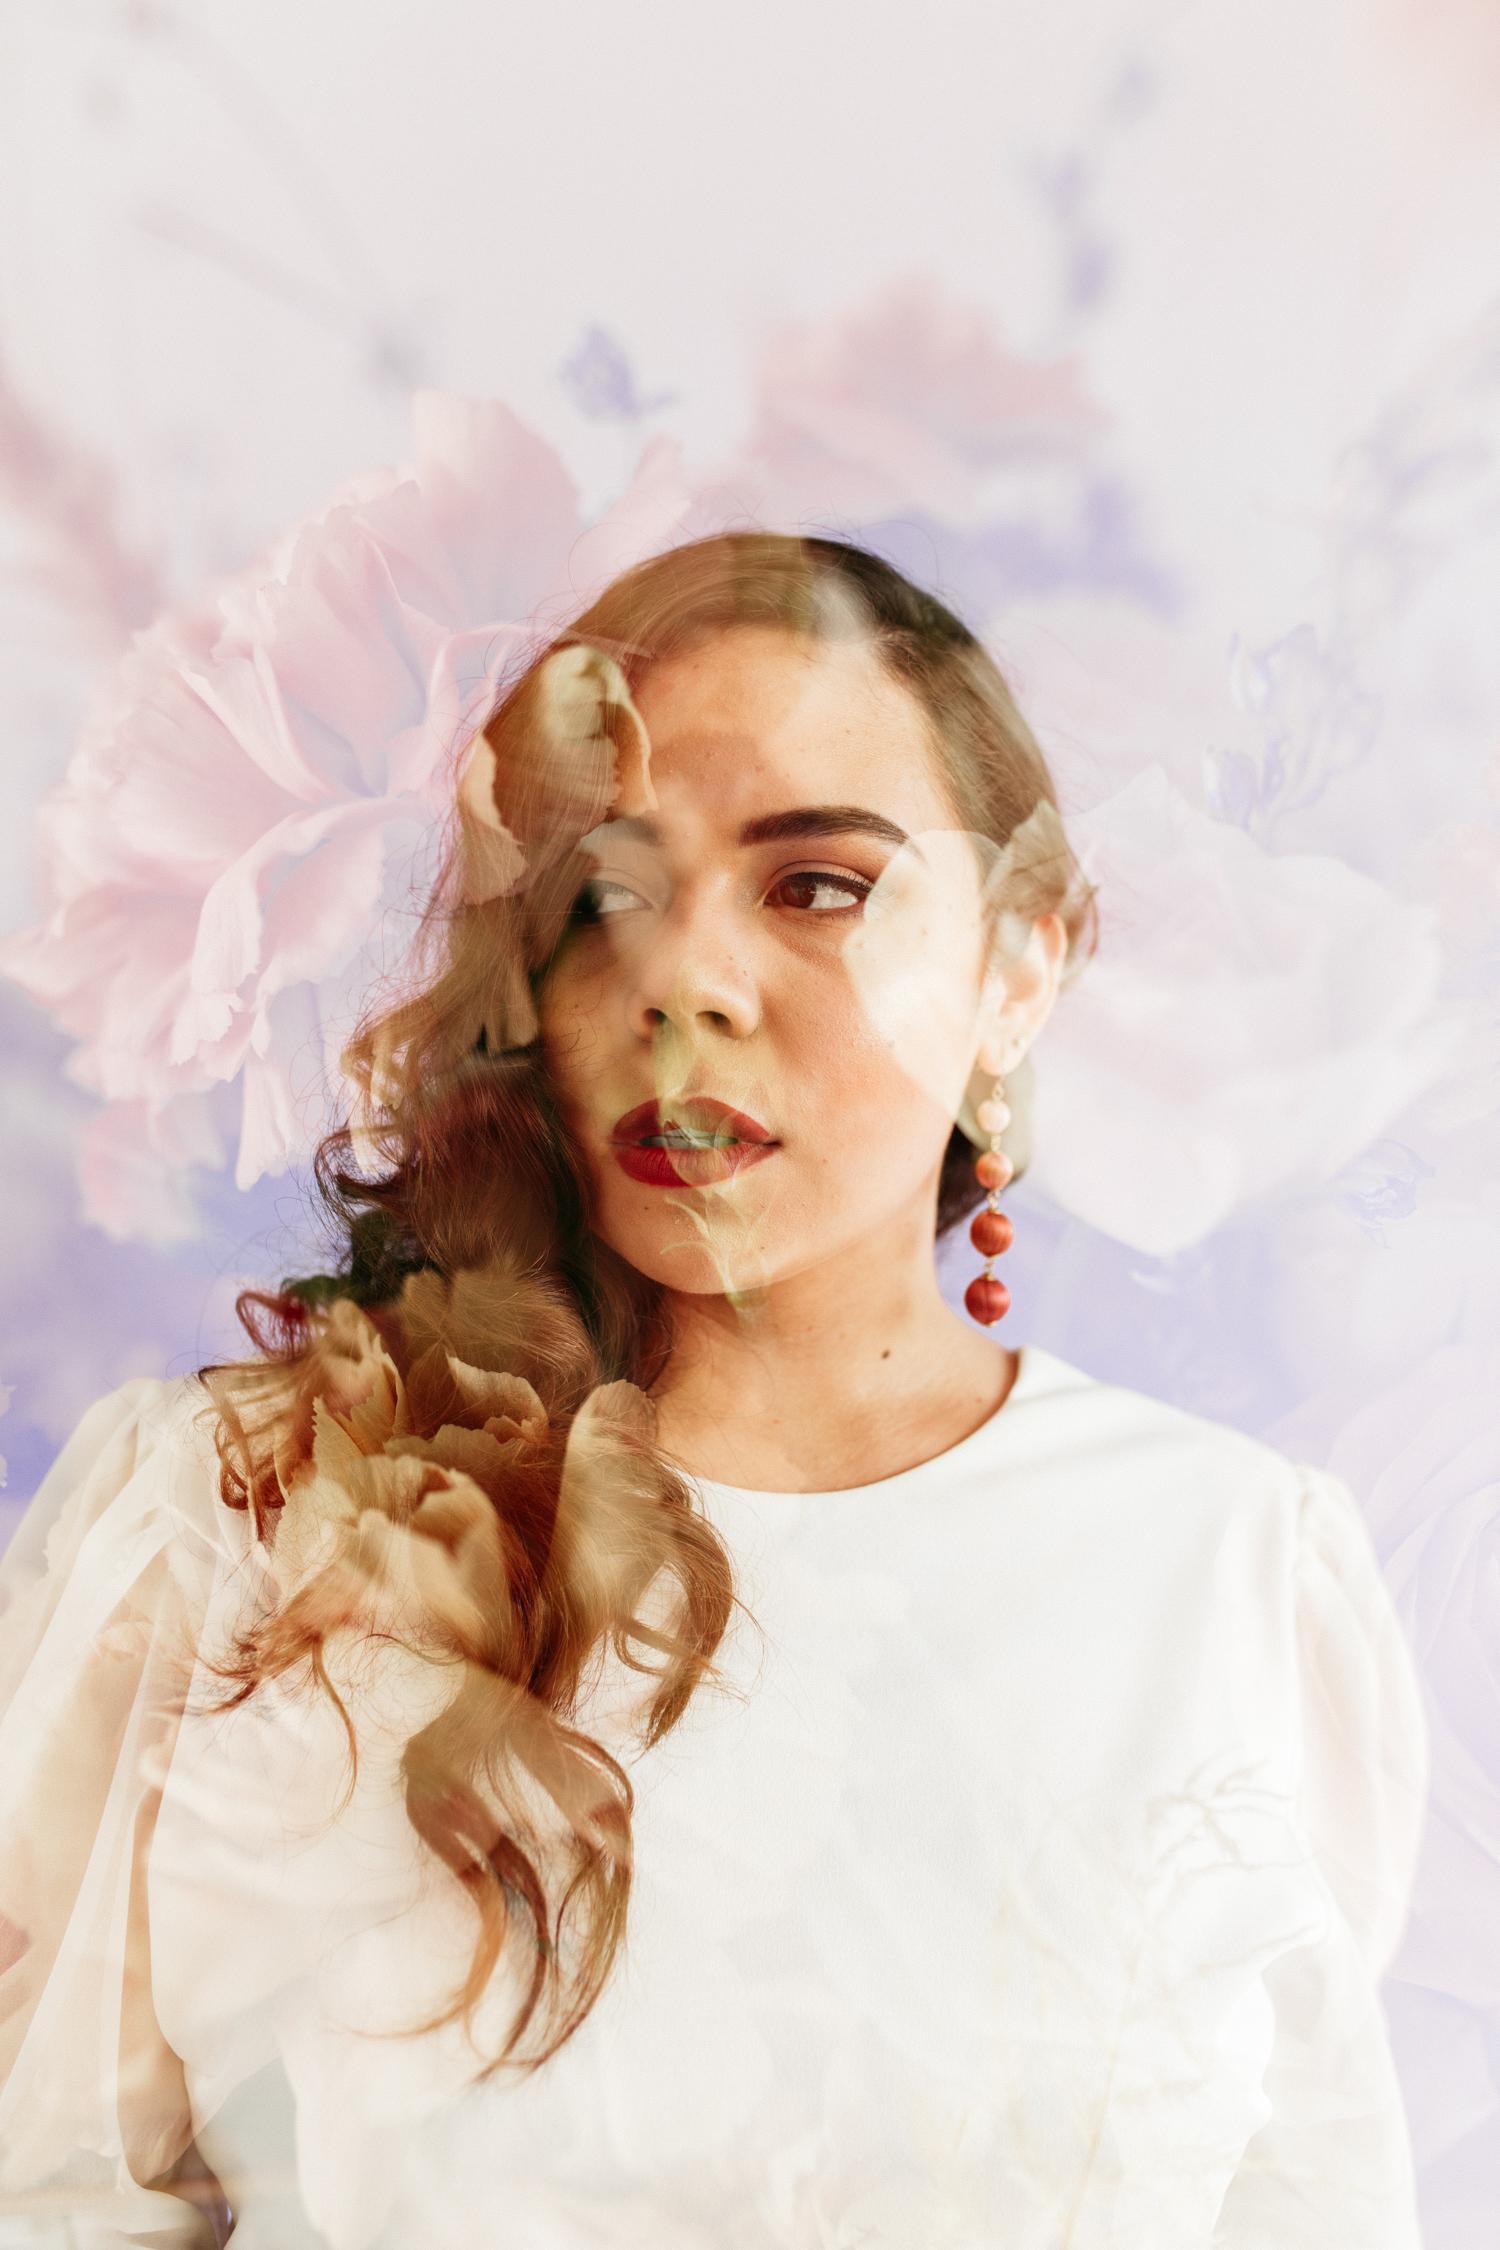 SamErica+Studios+-+Lavender+Lemonade+Modern+Bridal+Editorial+-42.jpg